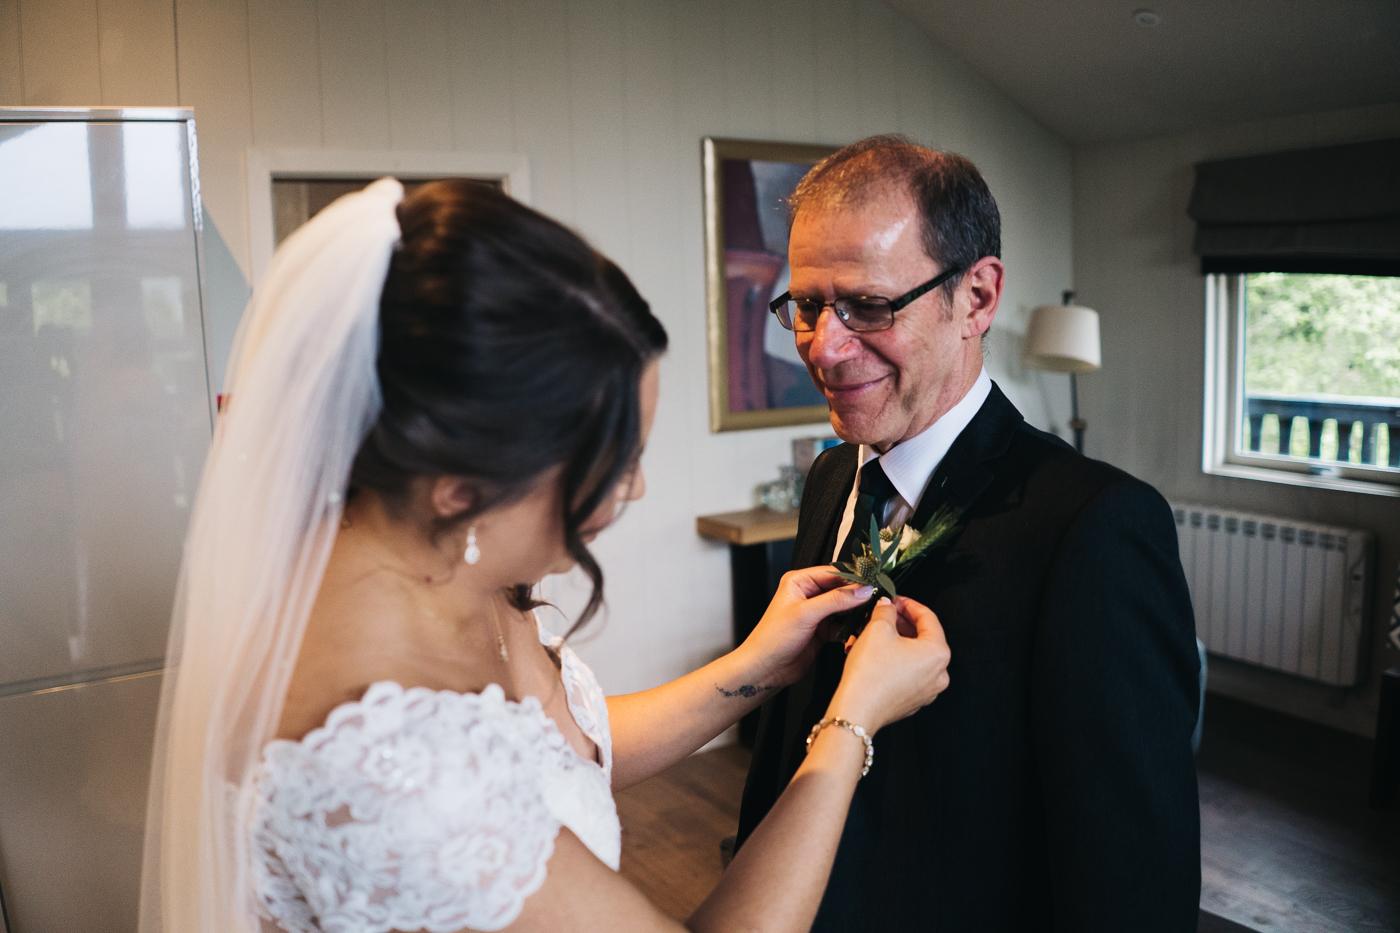 scottish-wedding-trossachs-loch-tay-highlannds-relaxed-photography-photographer-0010.jpg